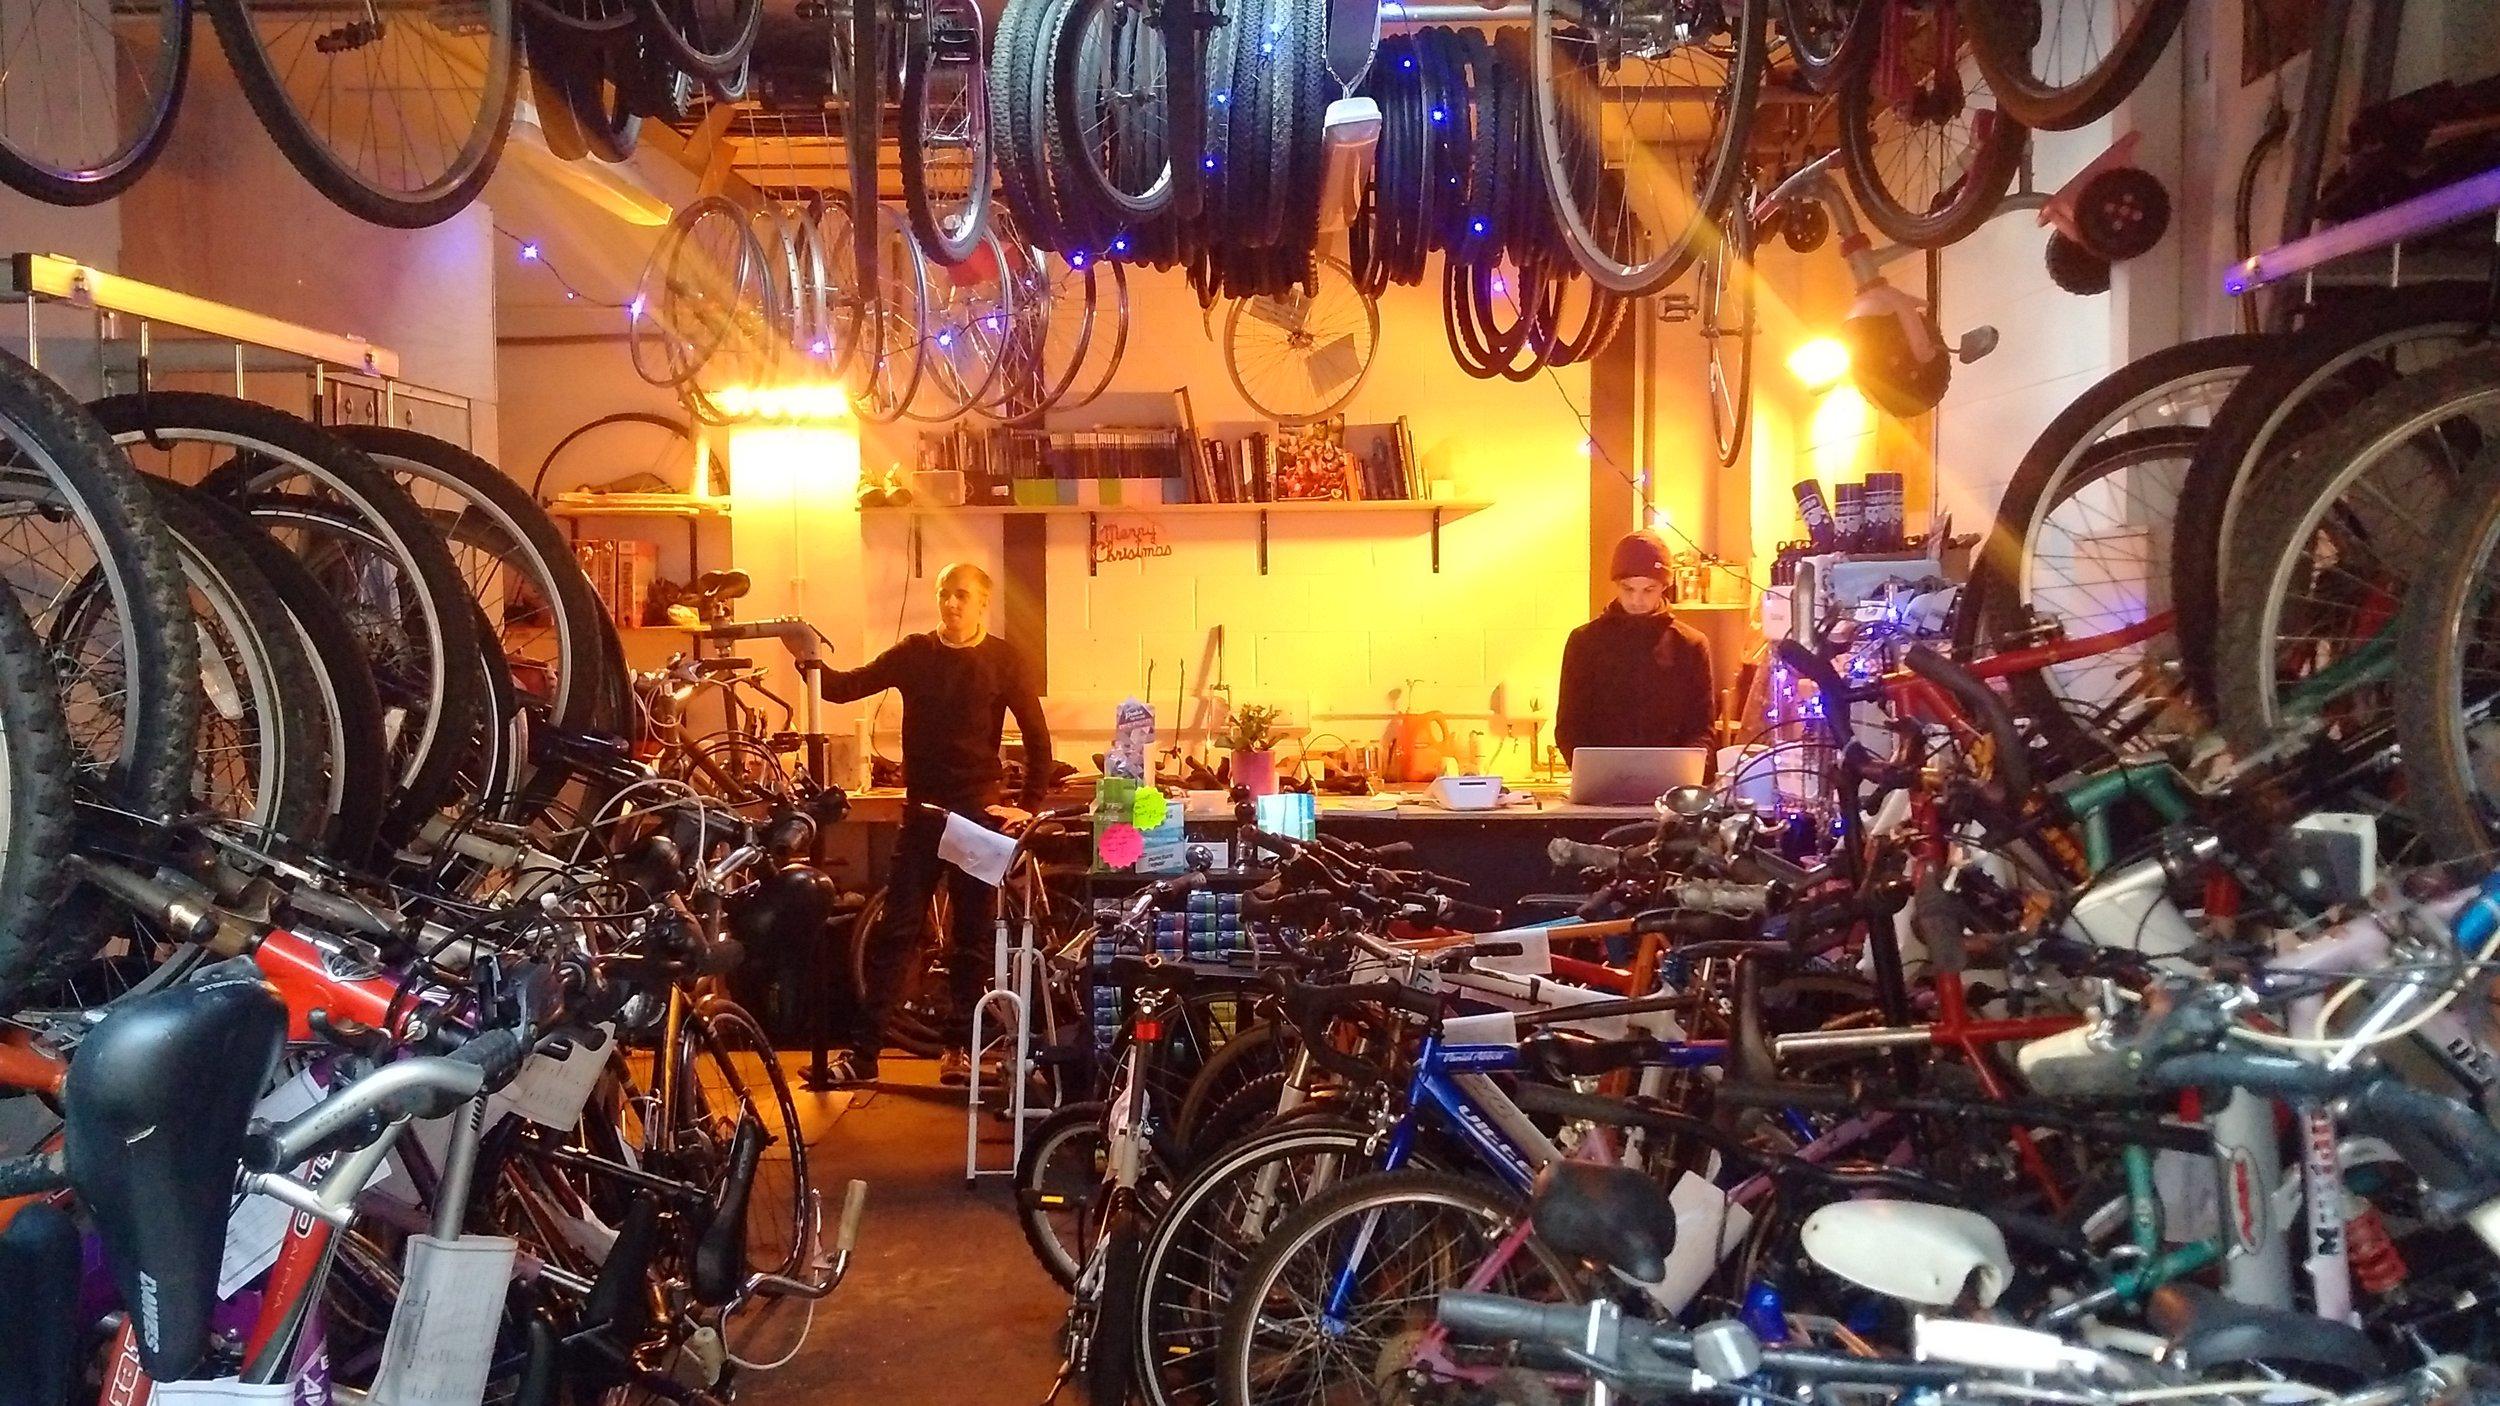 Neepsend, S3 - Bicycle Shop